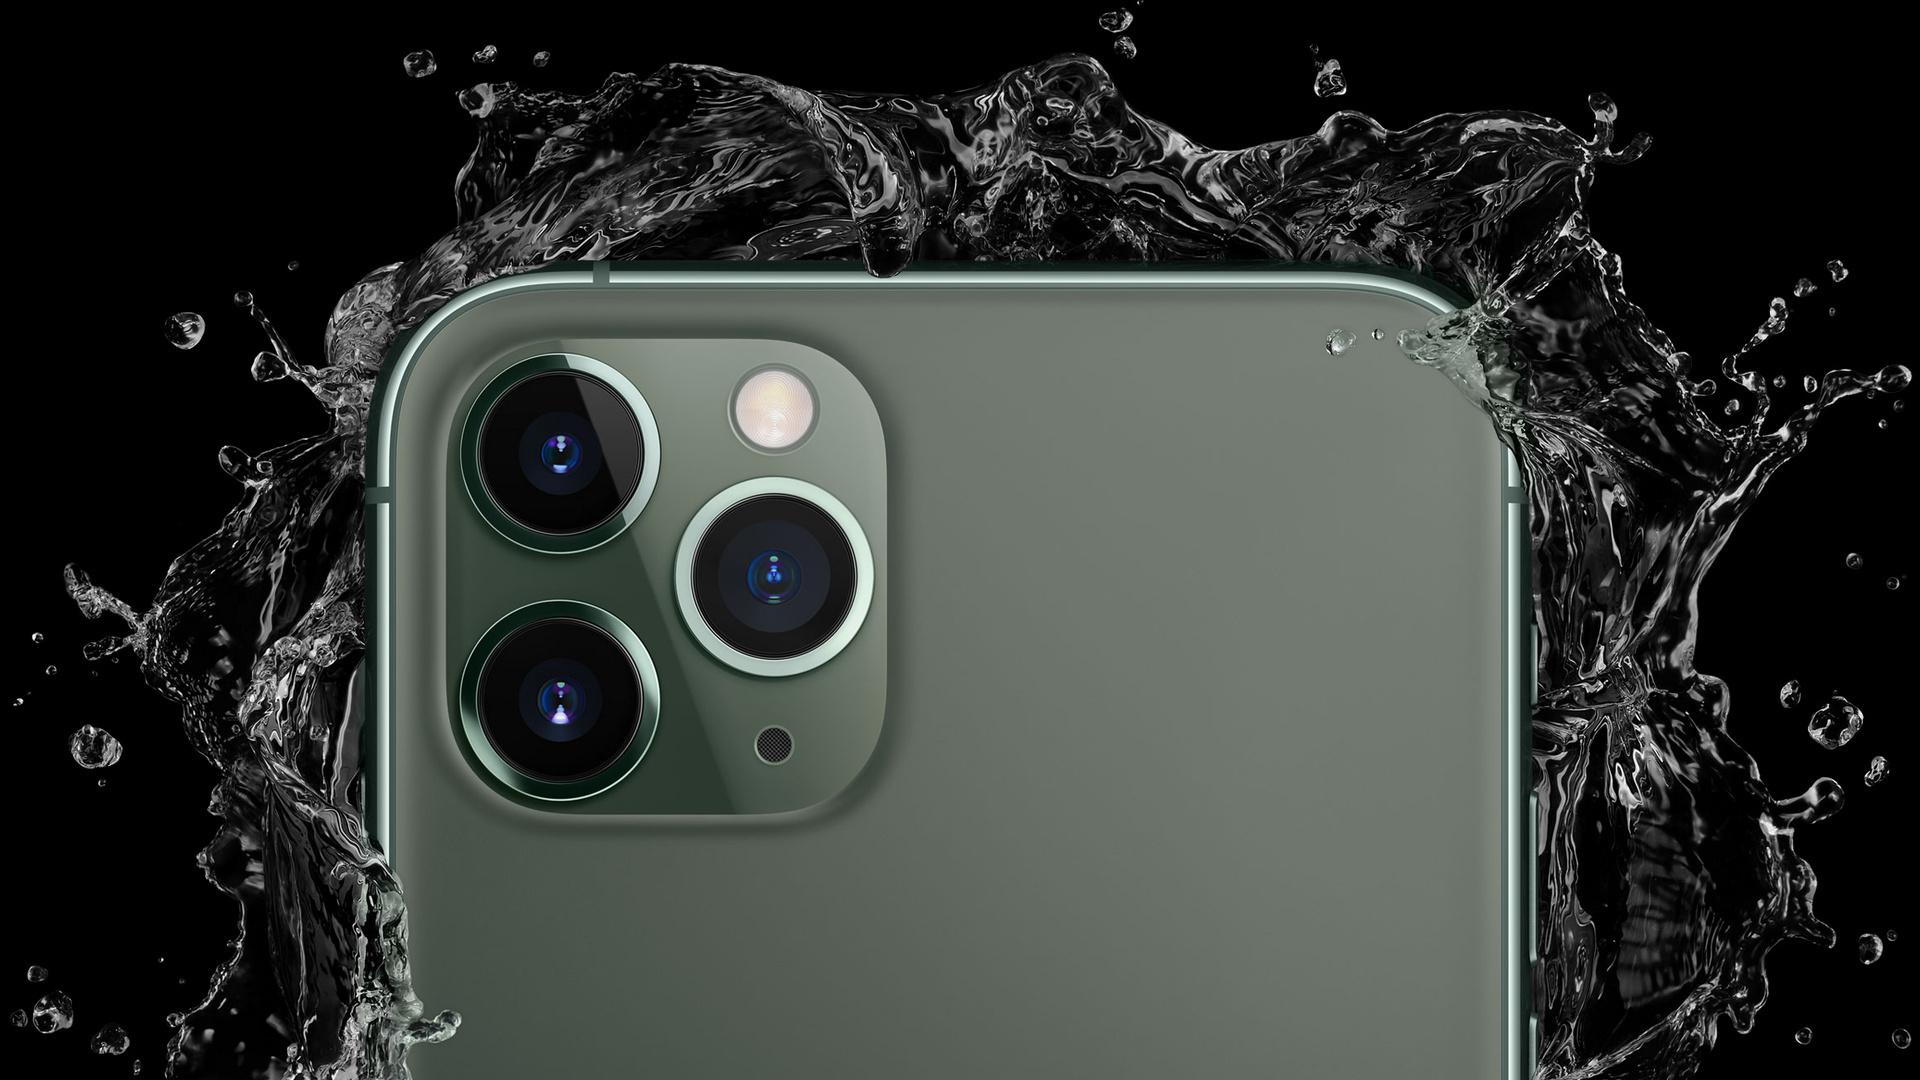 iPhone 11, iPhone XR и iPhone 8_какой из iphone выбрать - камеры iPhone 11 Pro